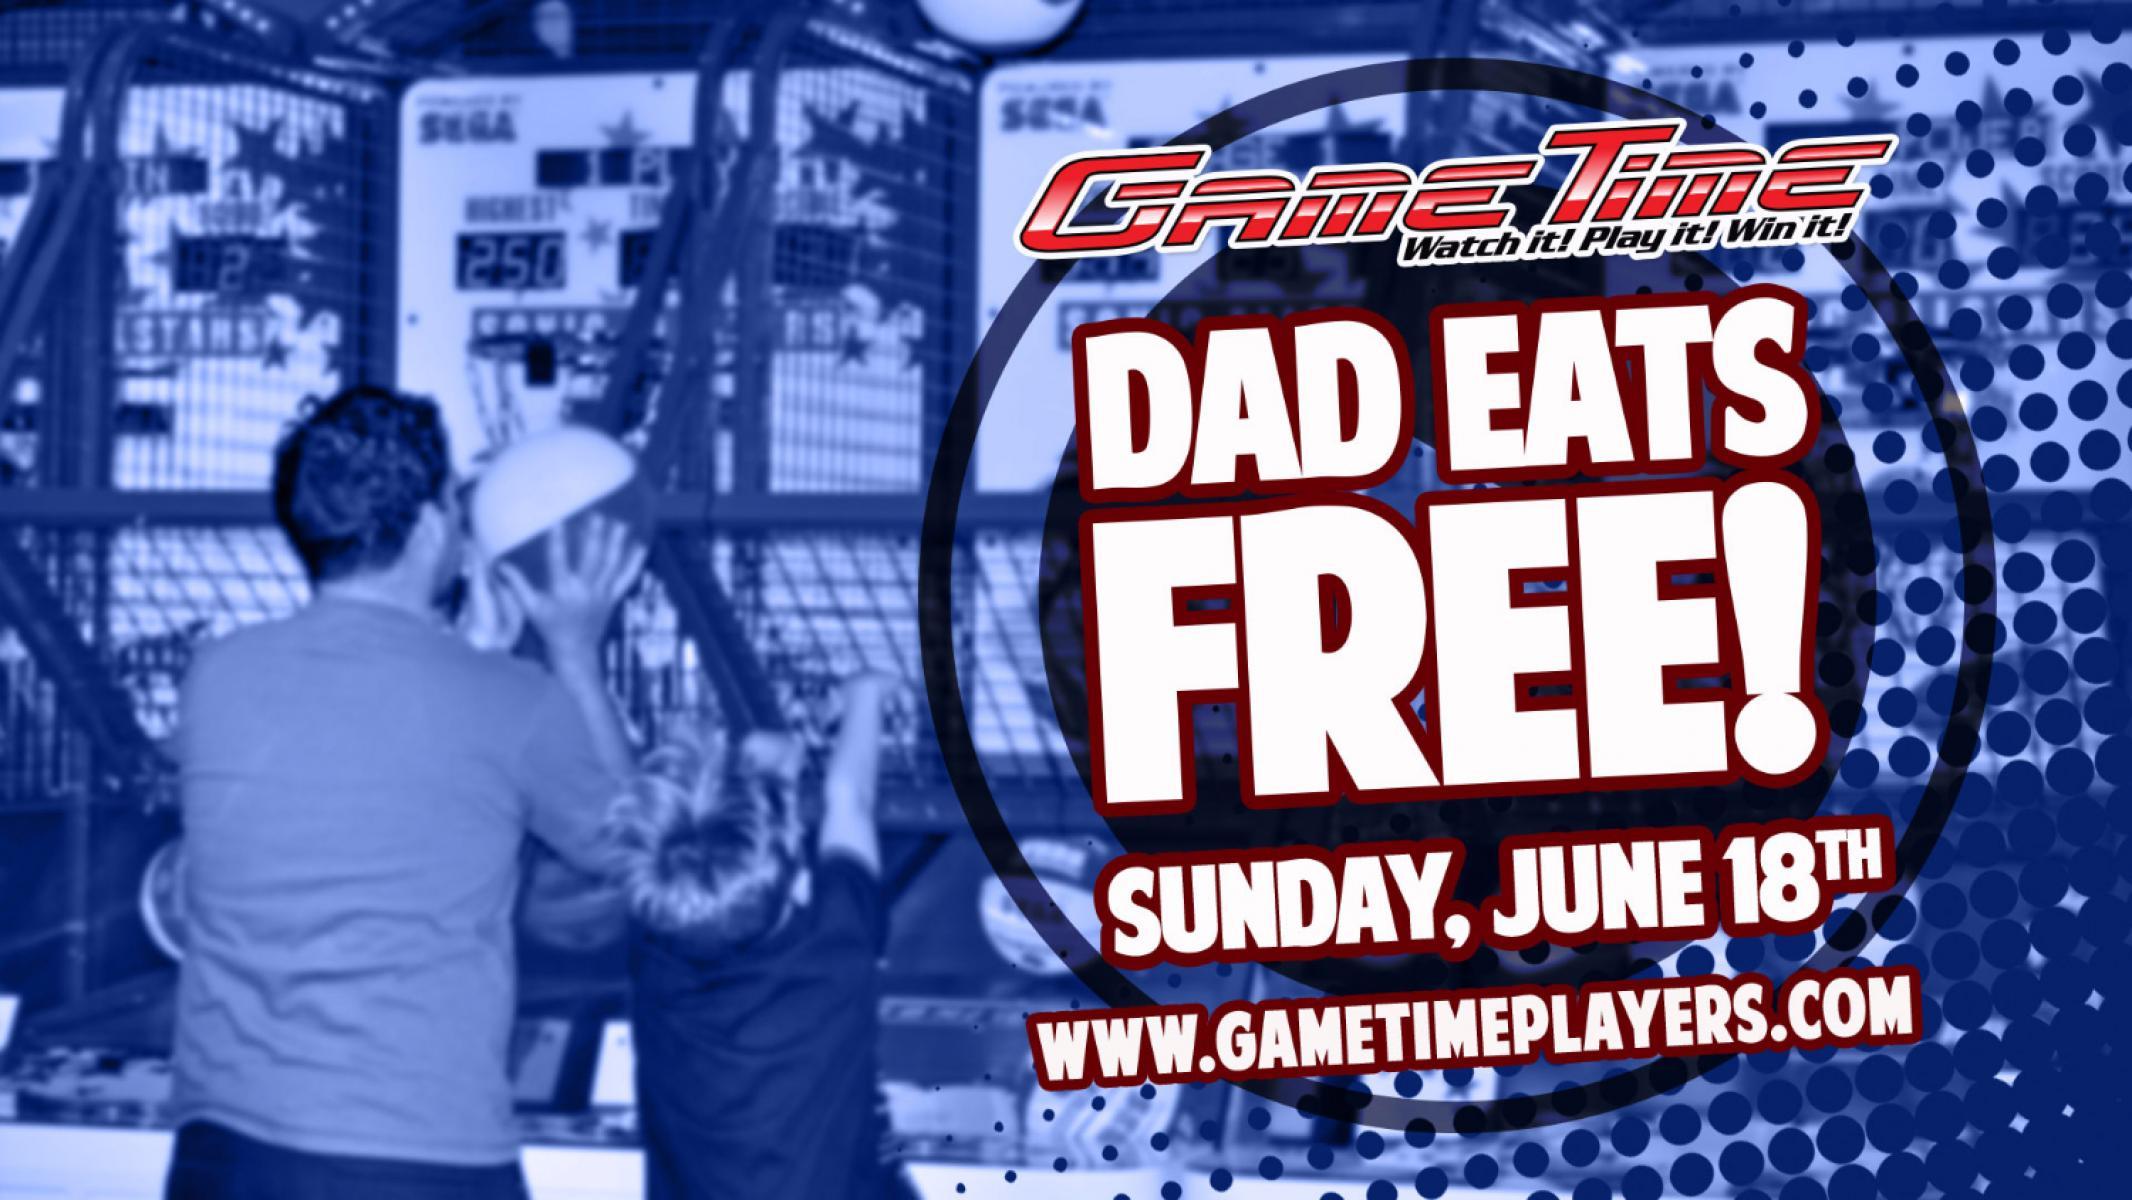 DAD EATS FREE!